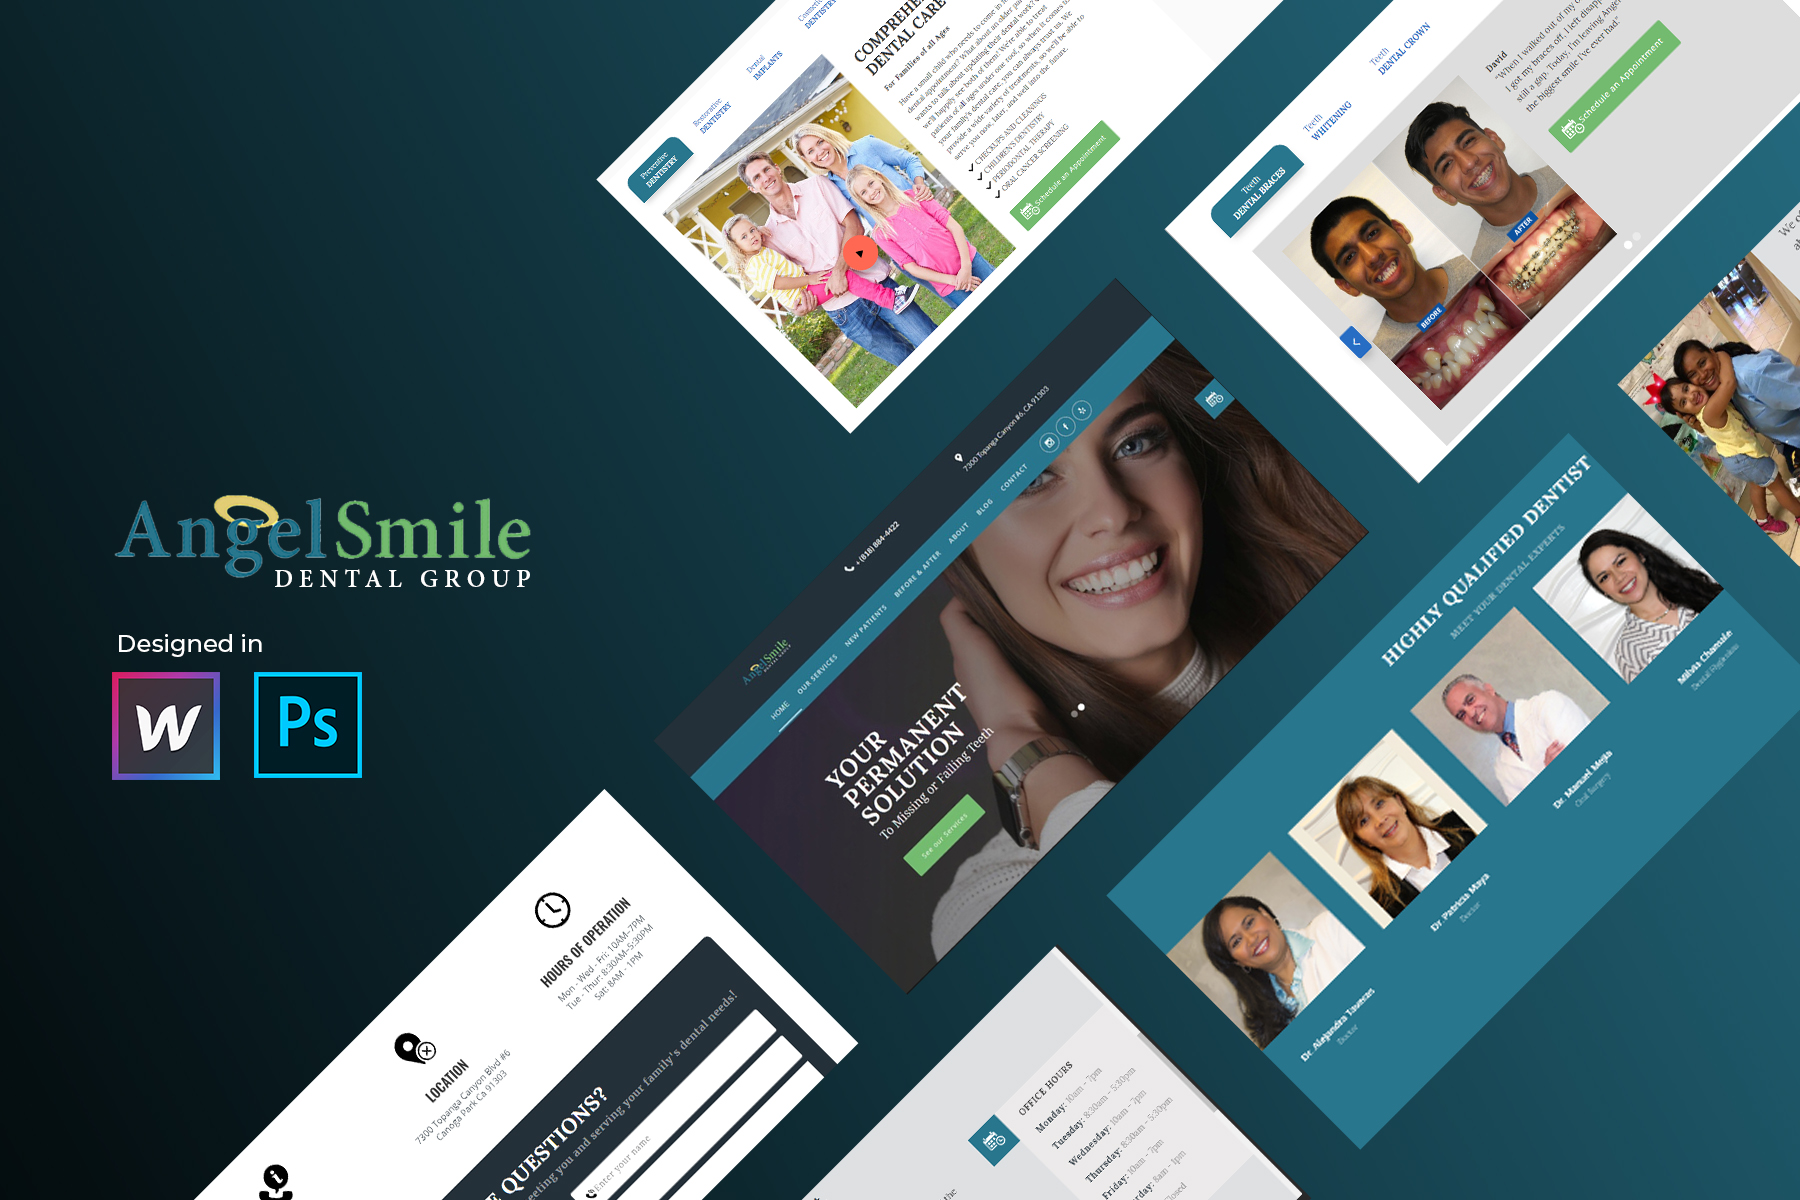 Dentist webflow design